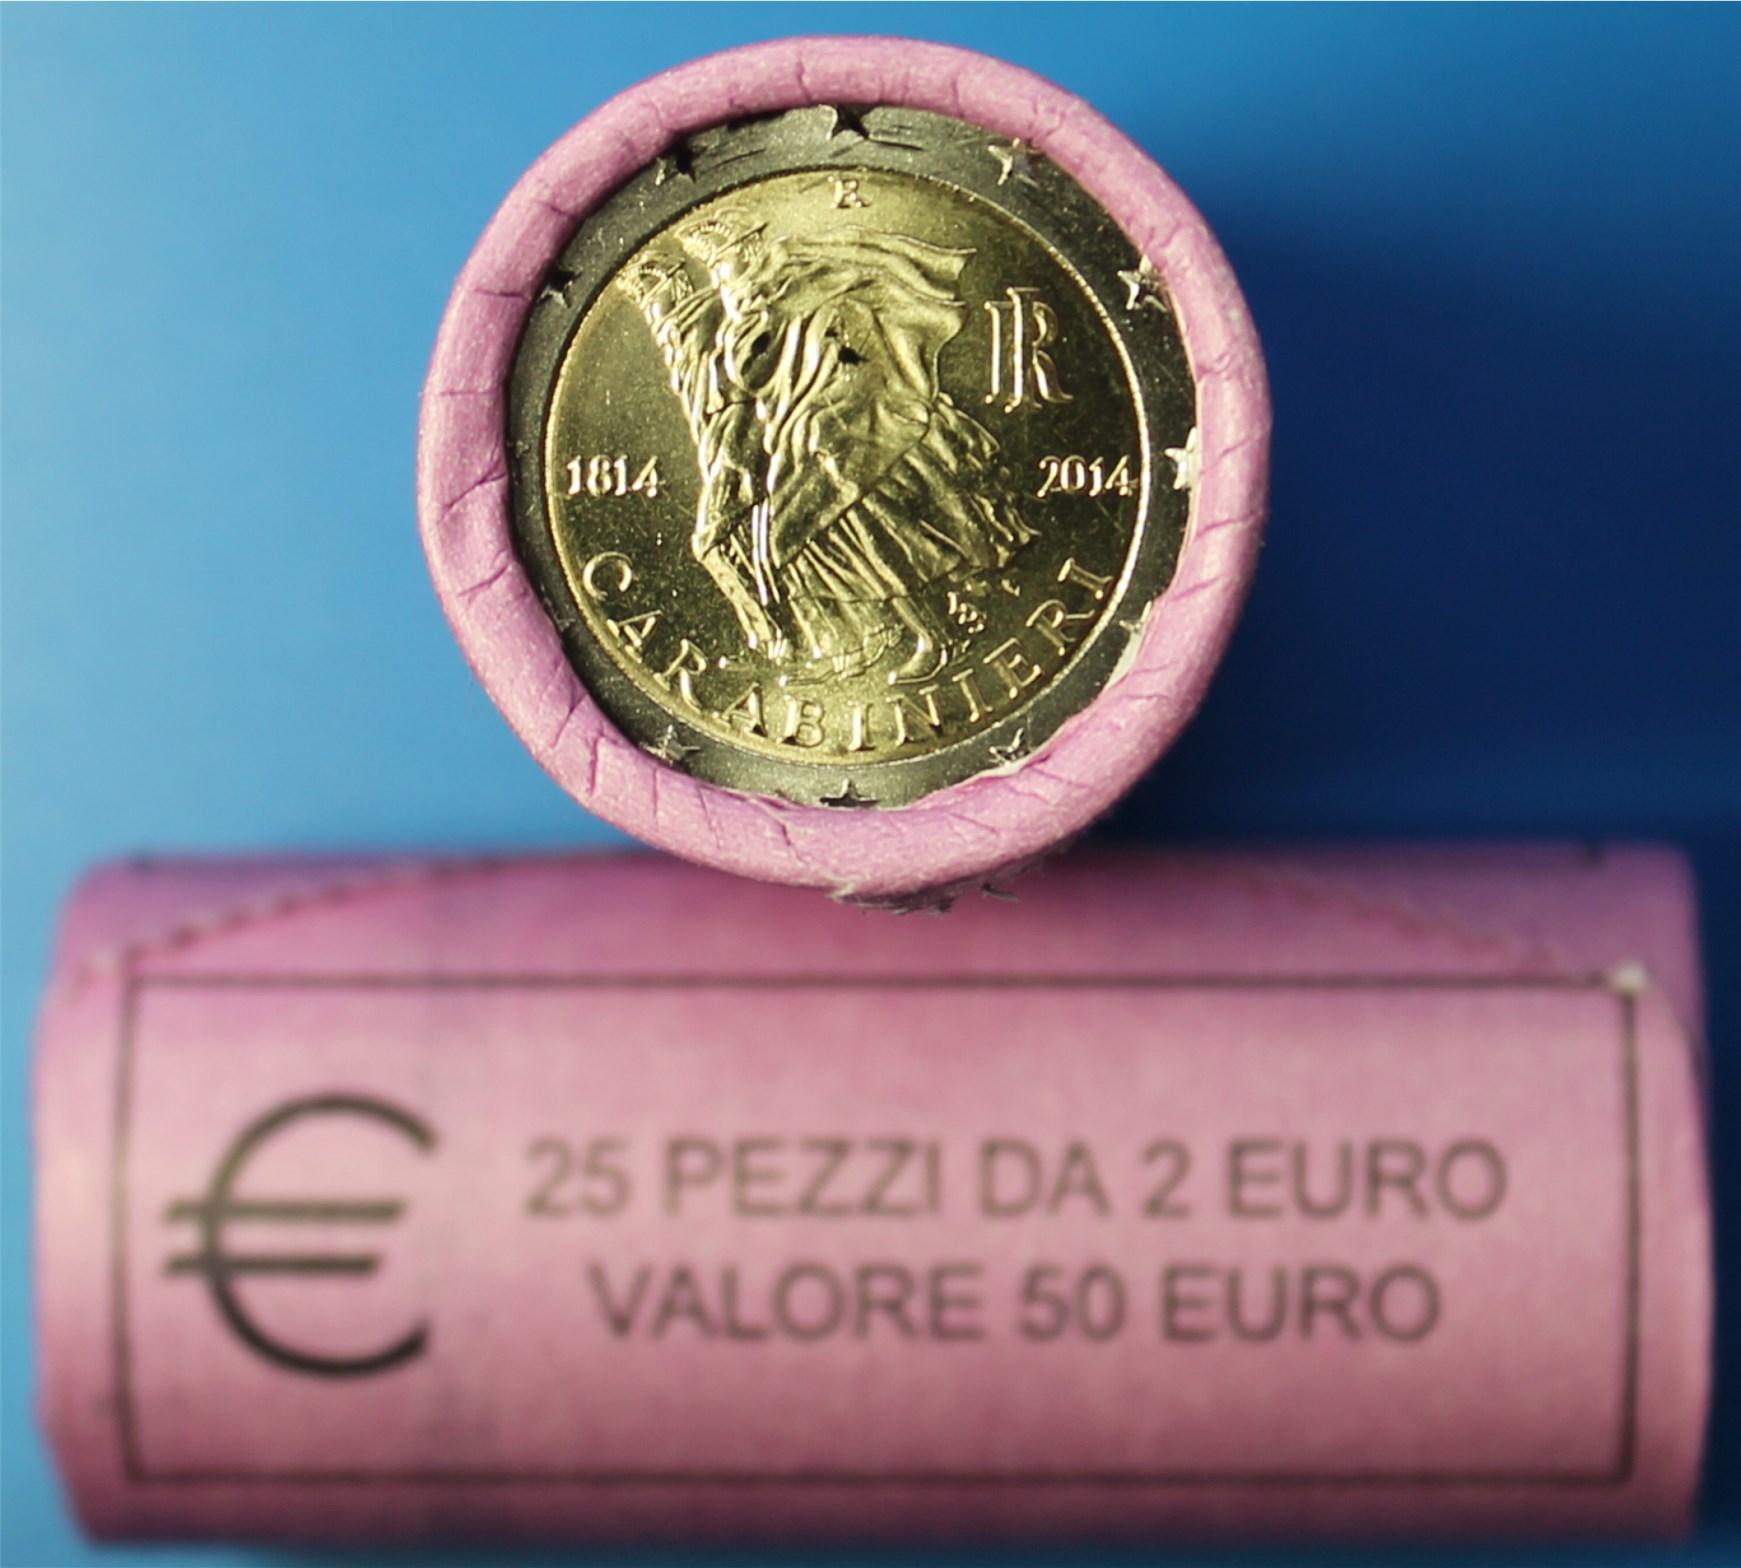 2 euro rolle italien 2014 carabinieri graf waldschrat. Black Bedroom Furniture Sets. Home Design Ideas